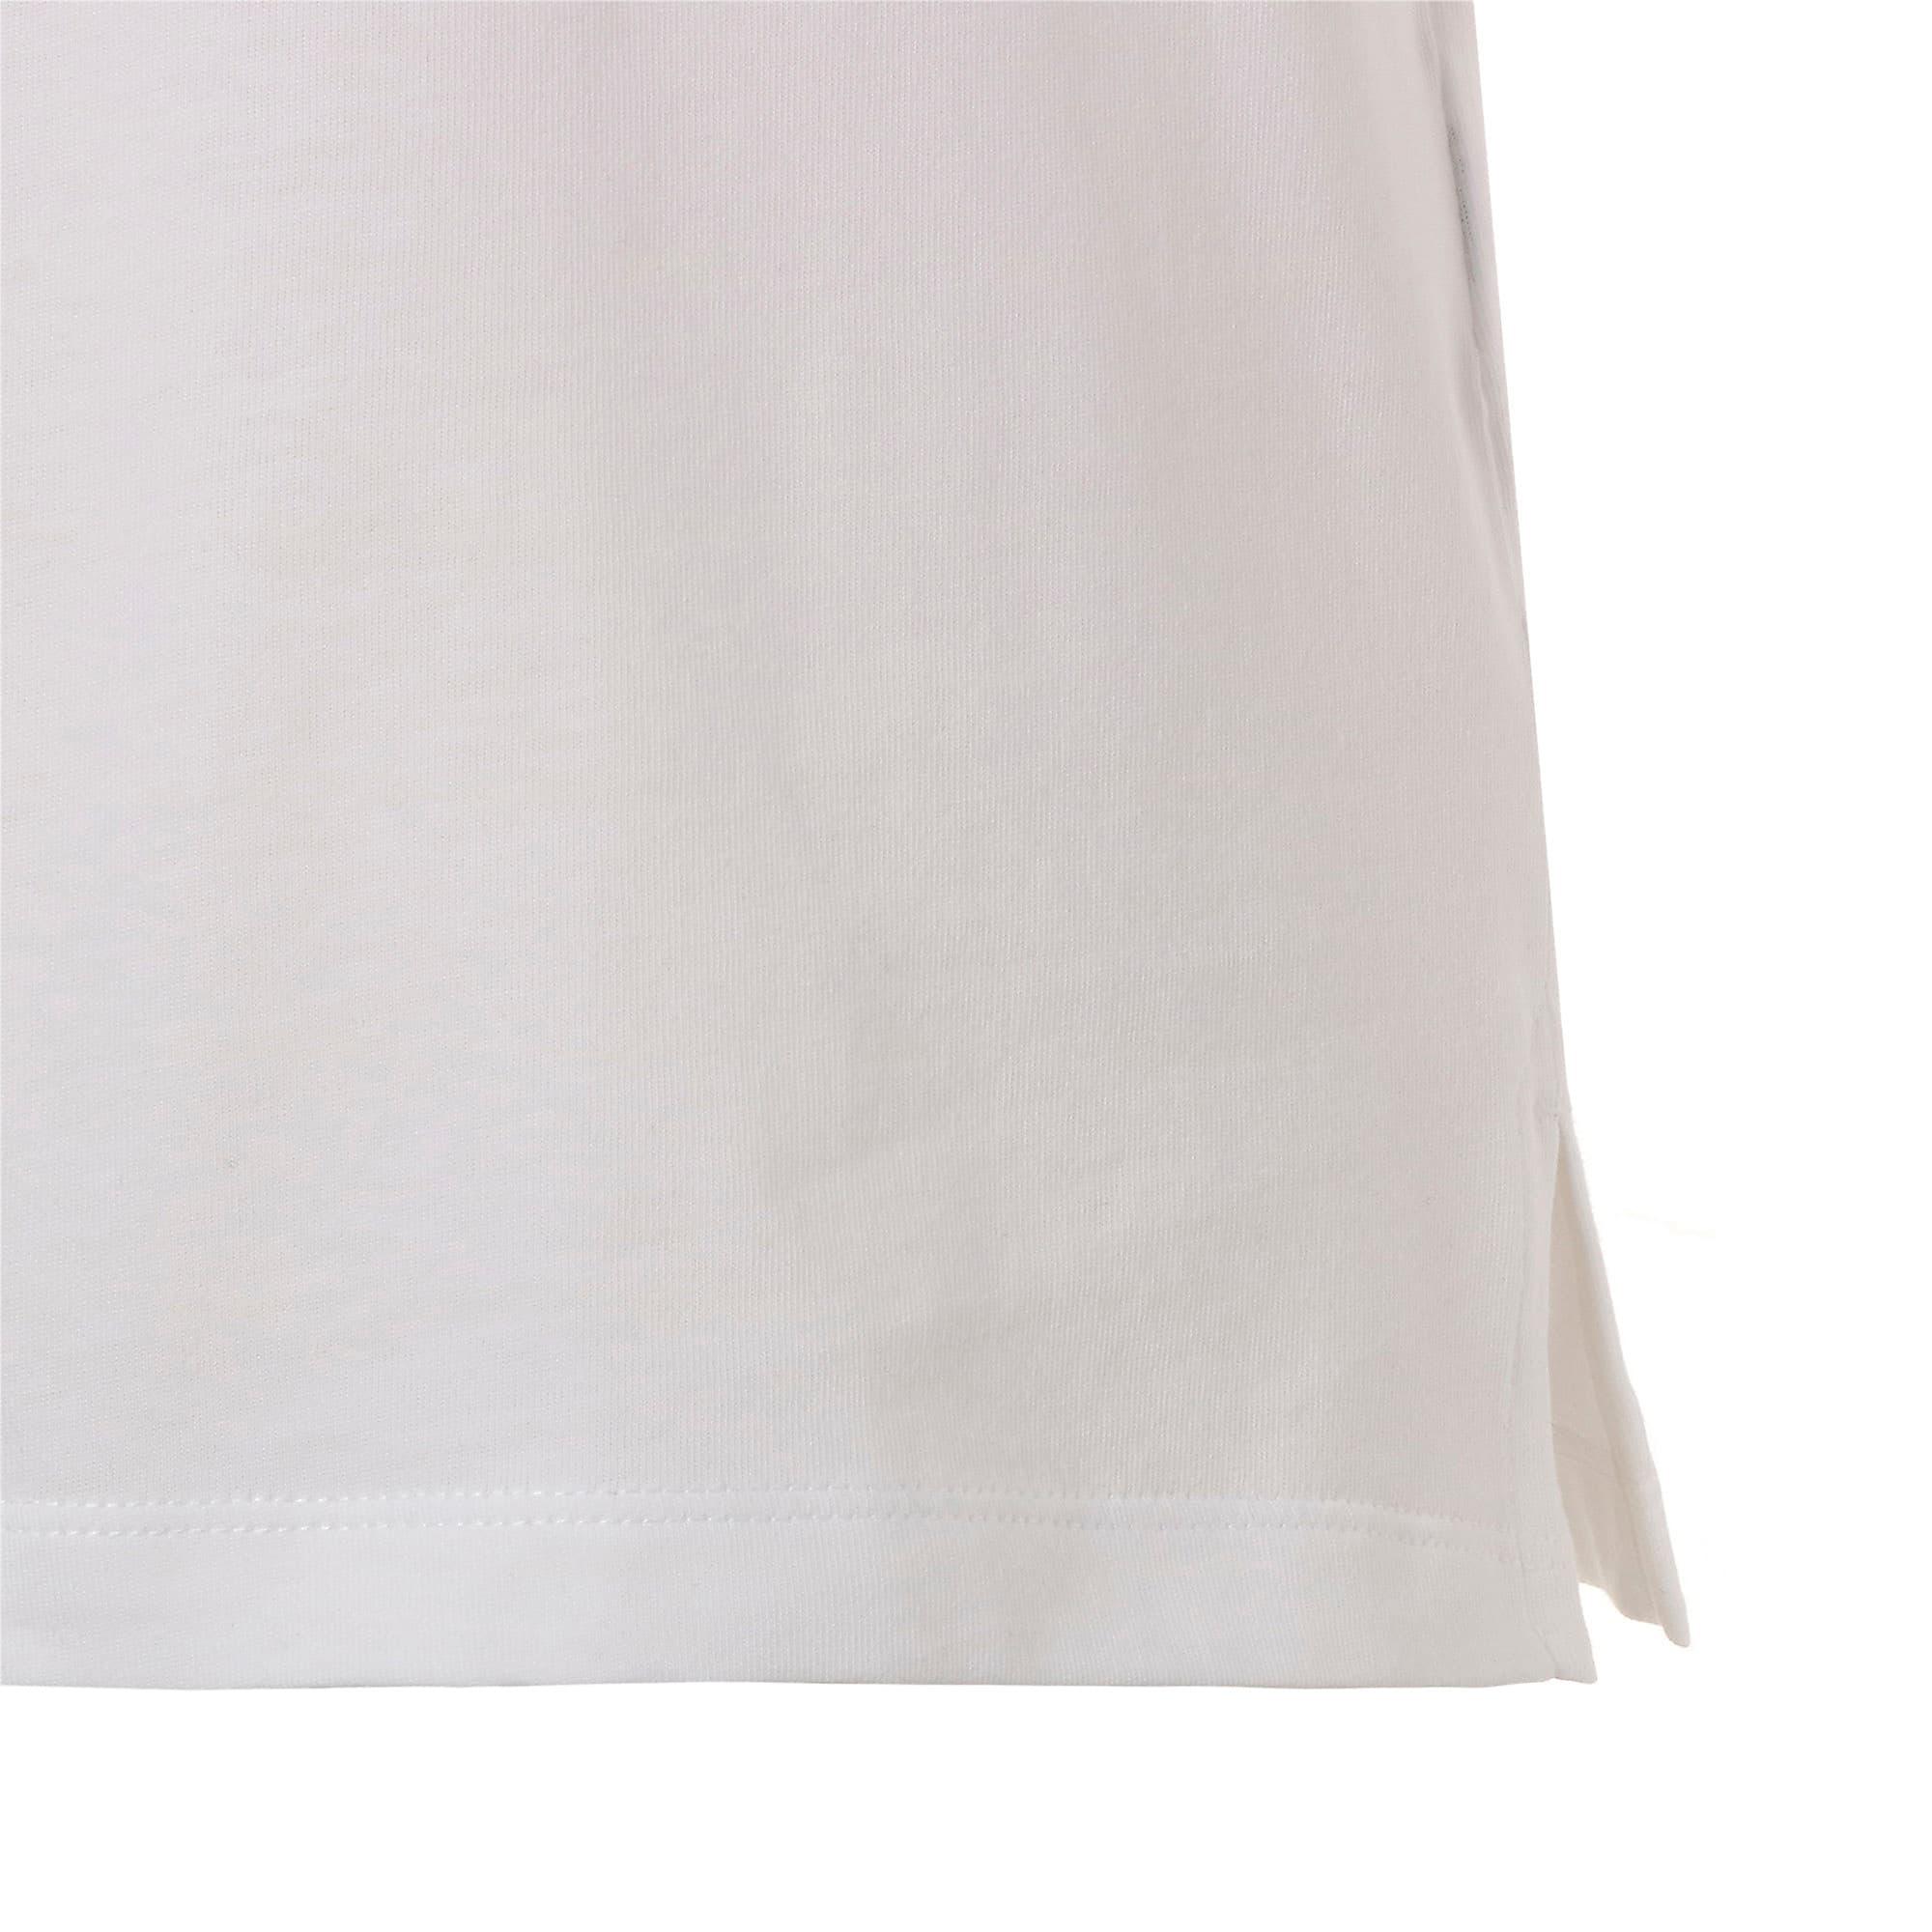 Thumbnail 9 of CLASSICS ロゴ ウィメンズ SS Tシャツ, Puma White, medium-JPN